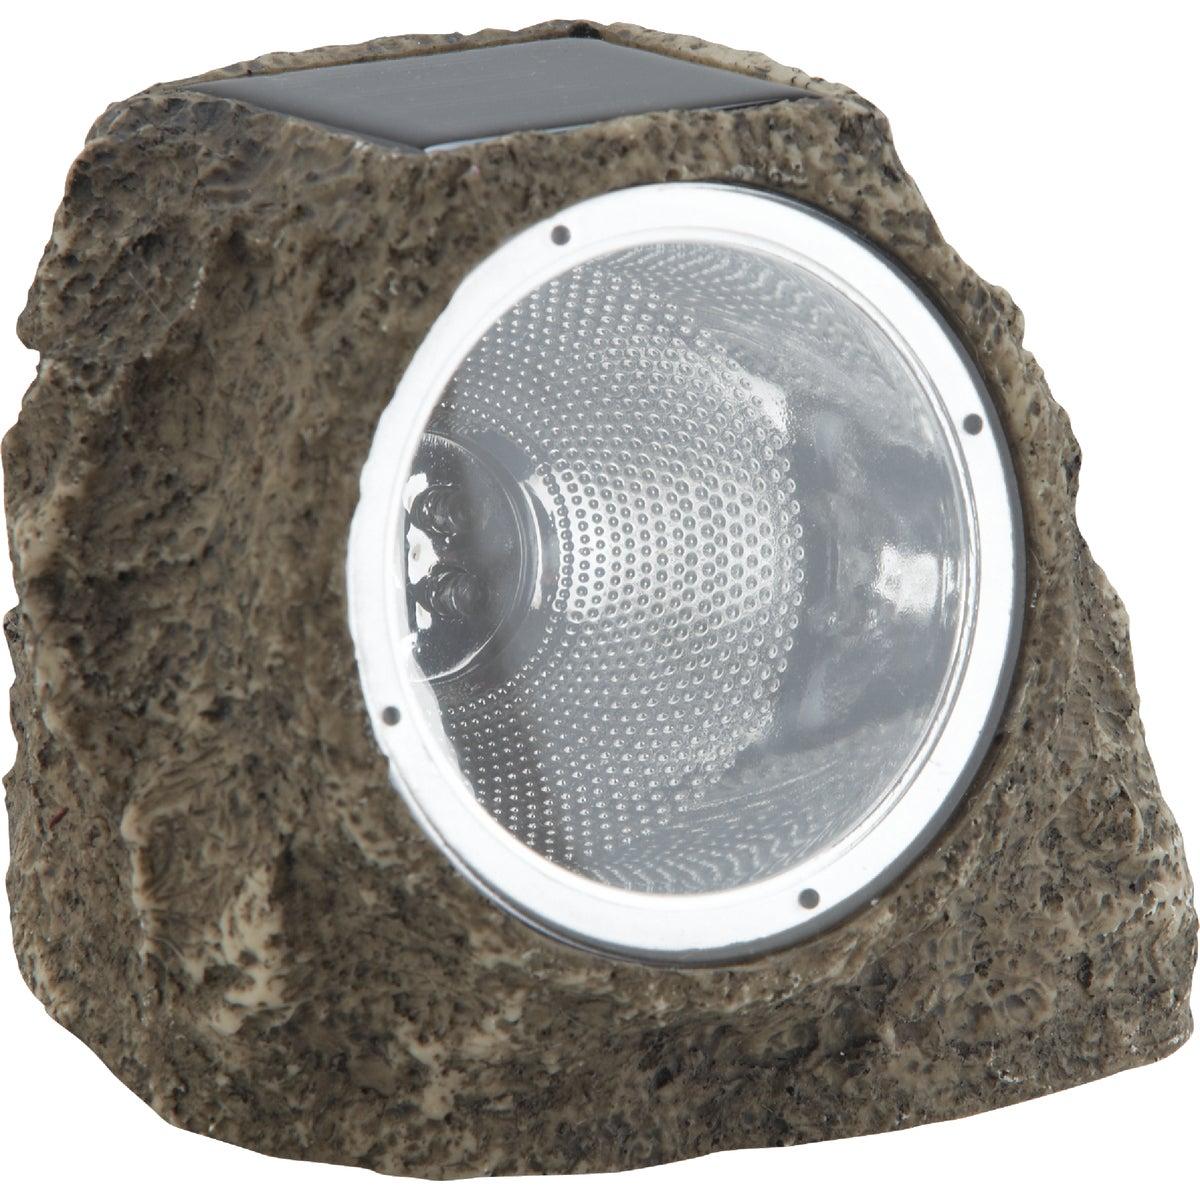 TAN SOLAR ROCK LIGHT